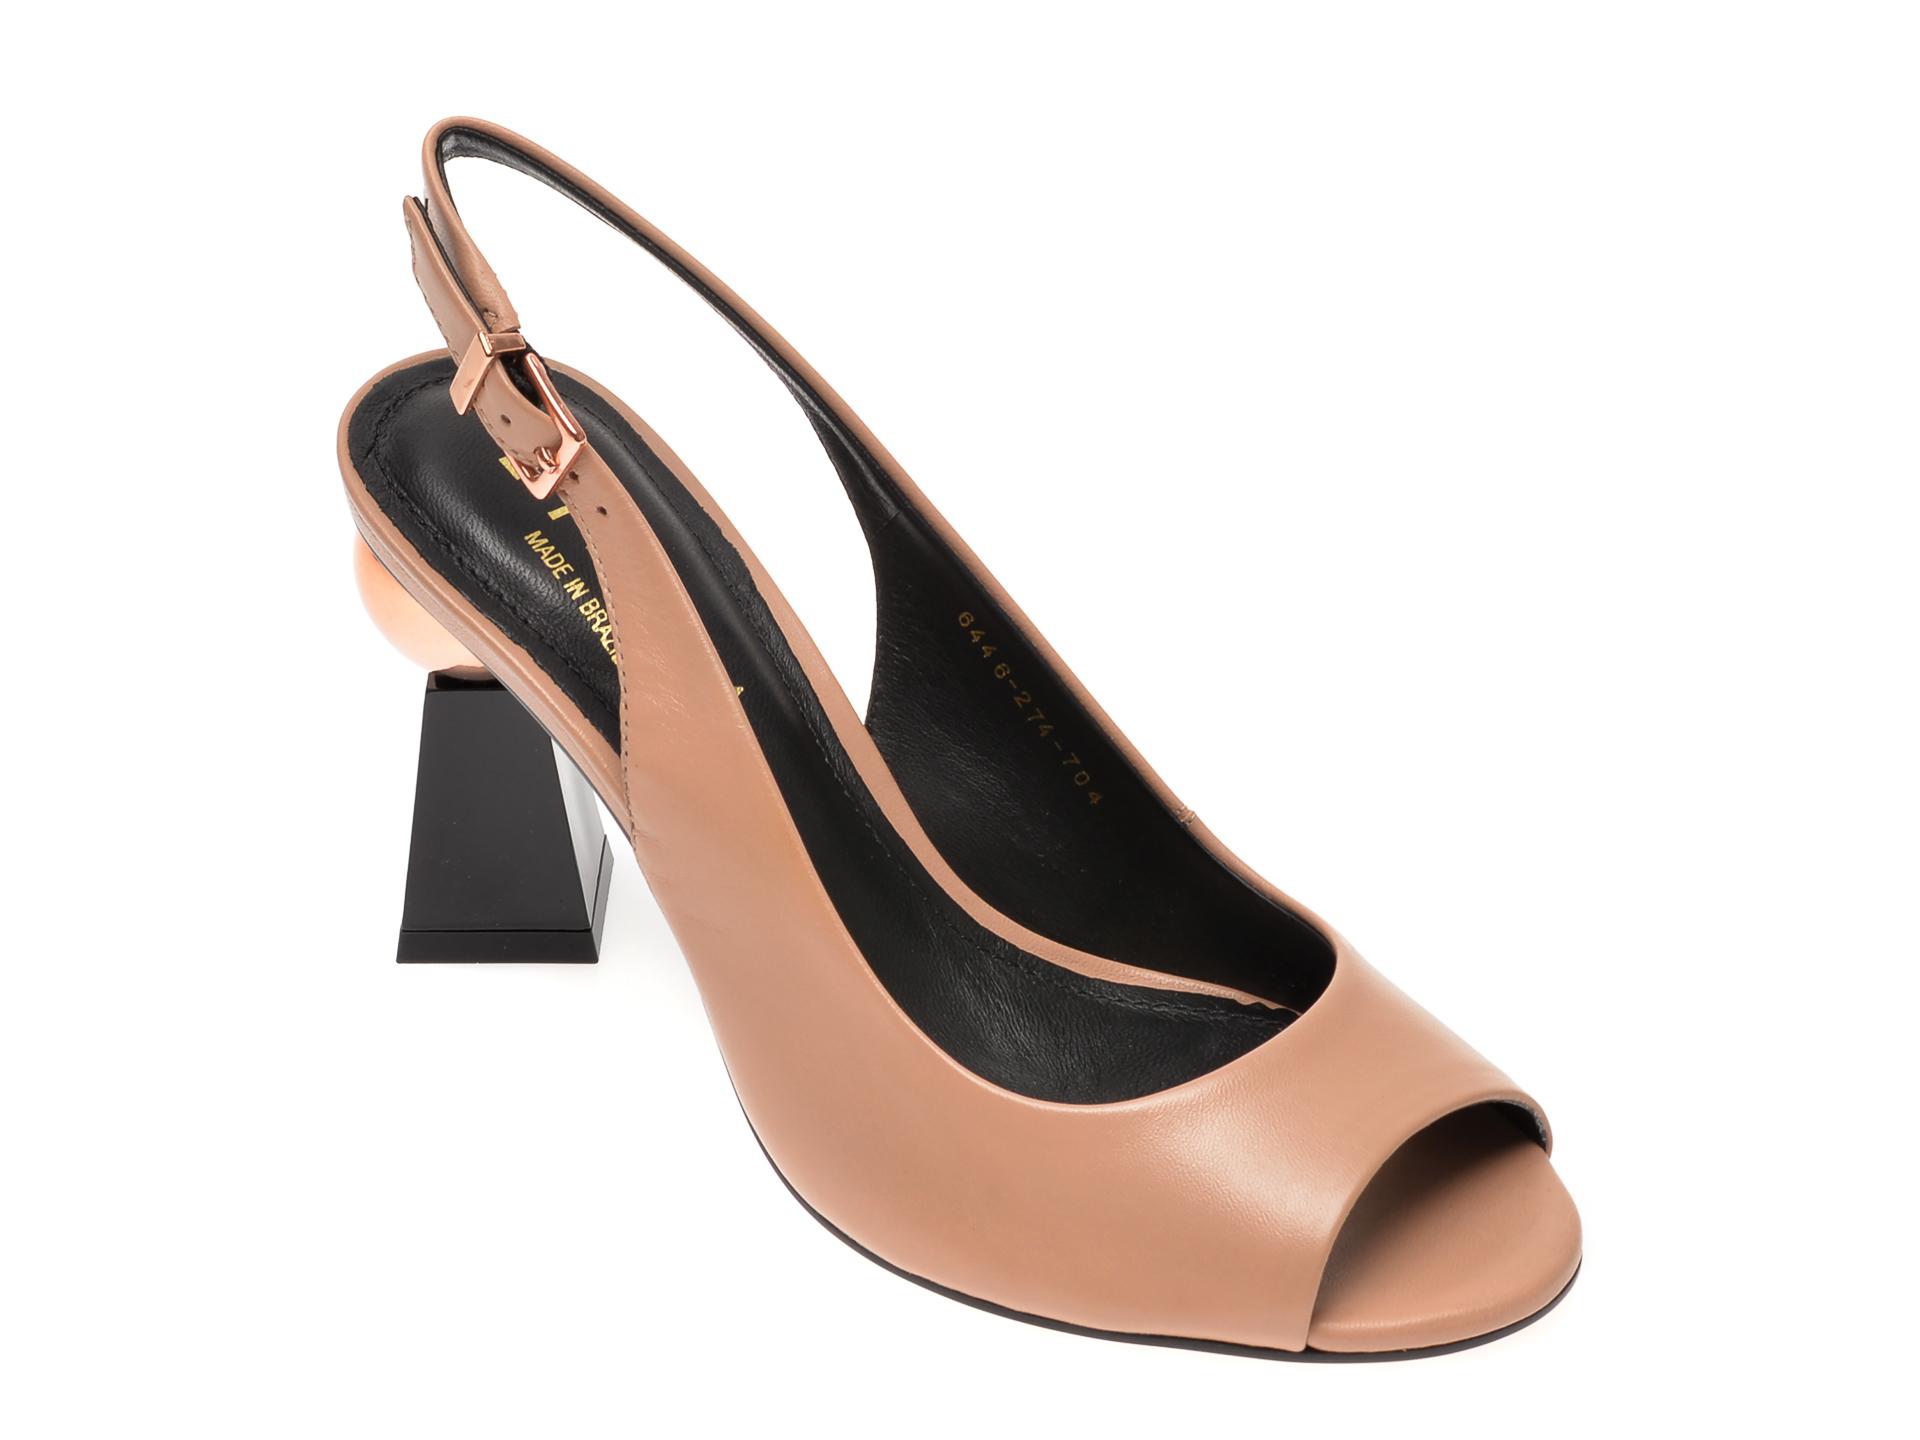 Sandale EPICA bej, 6446274, din piele naturala